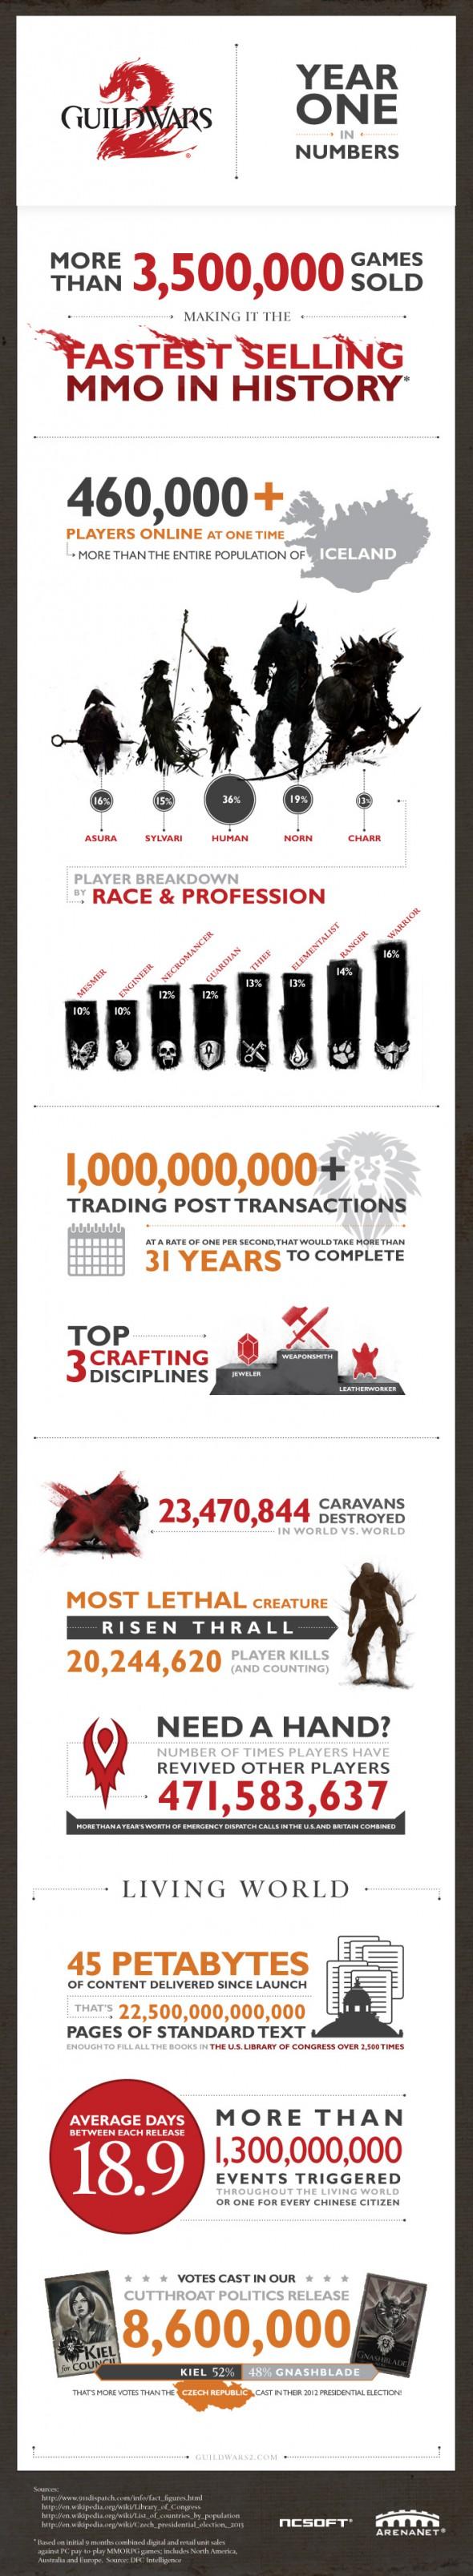 GW2_Anniv_Infographic